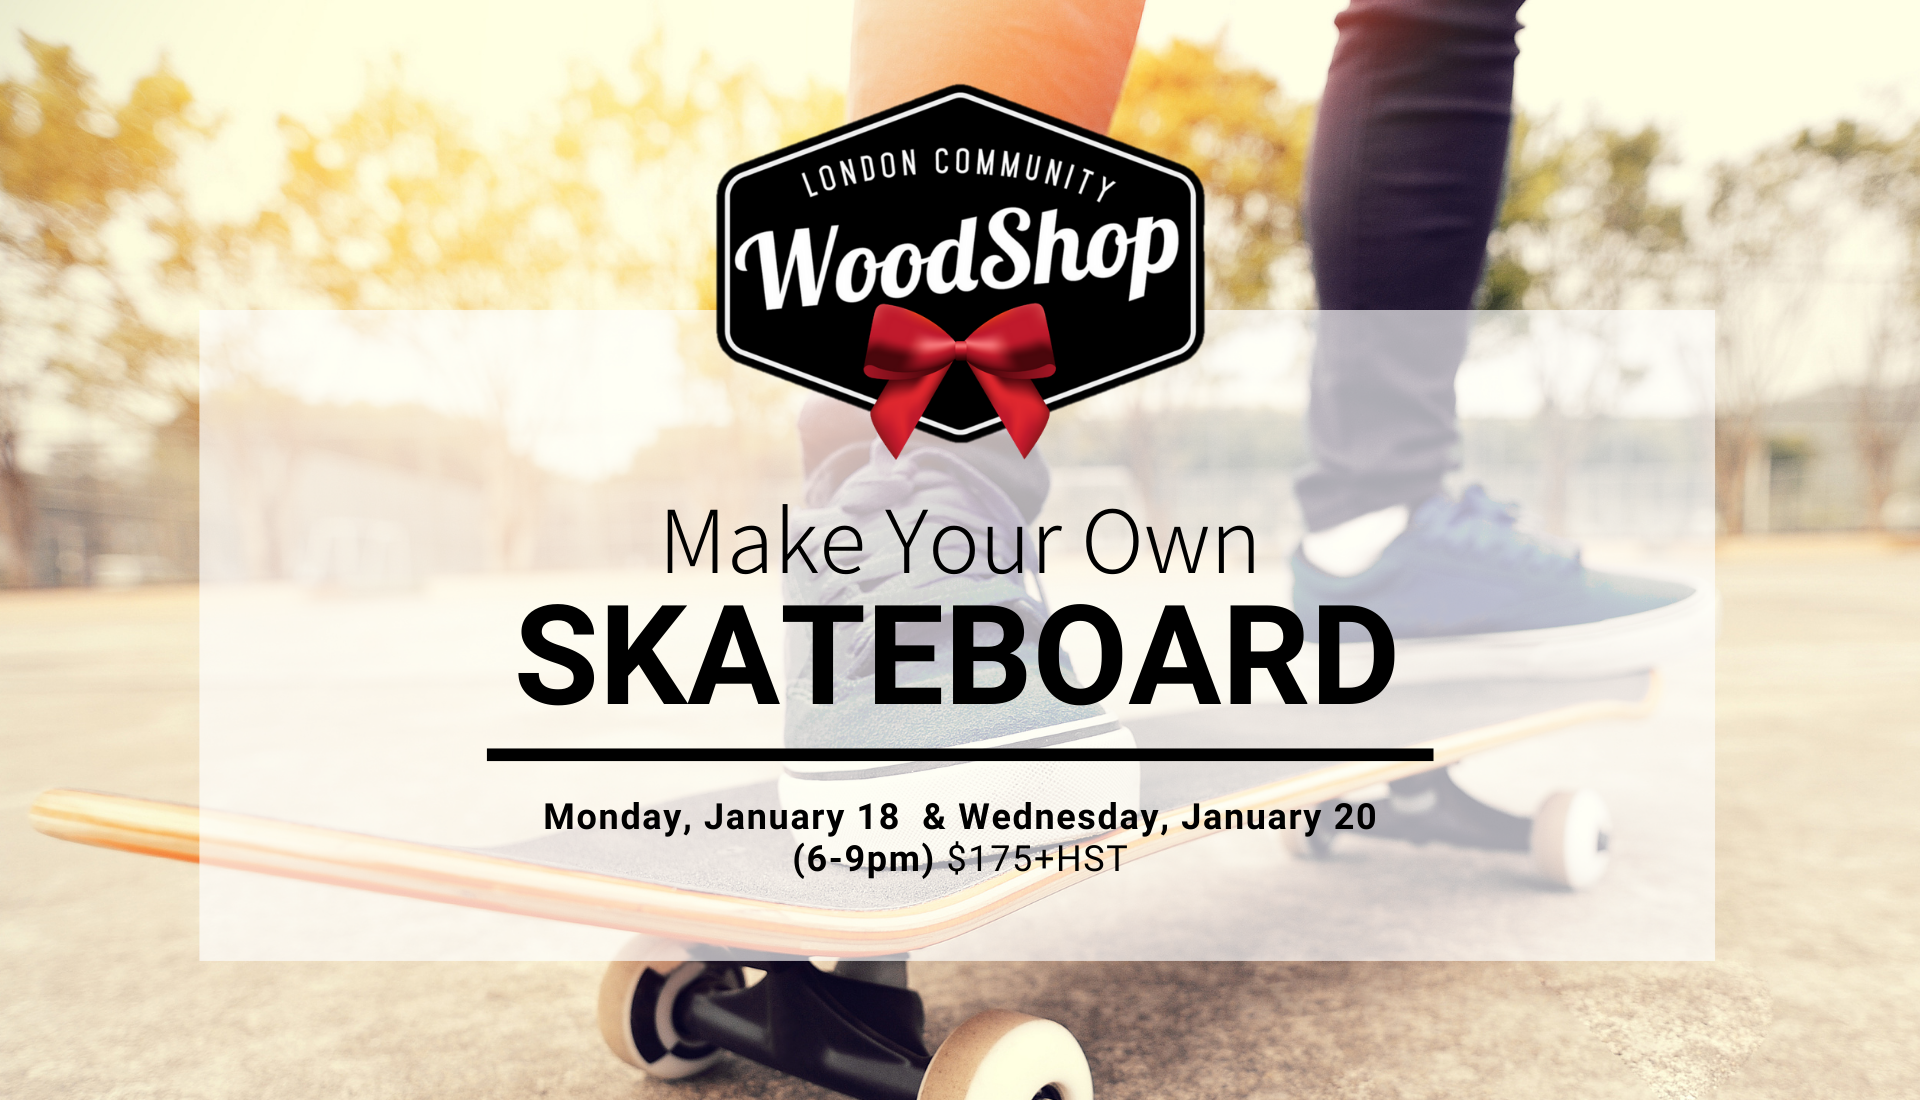 SkateBoard January 2020